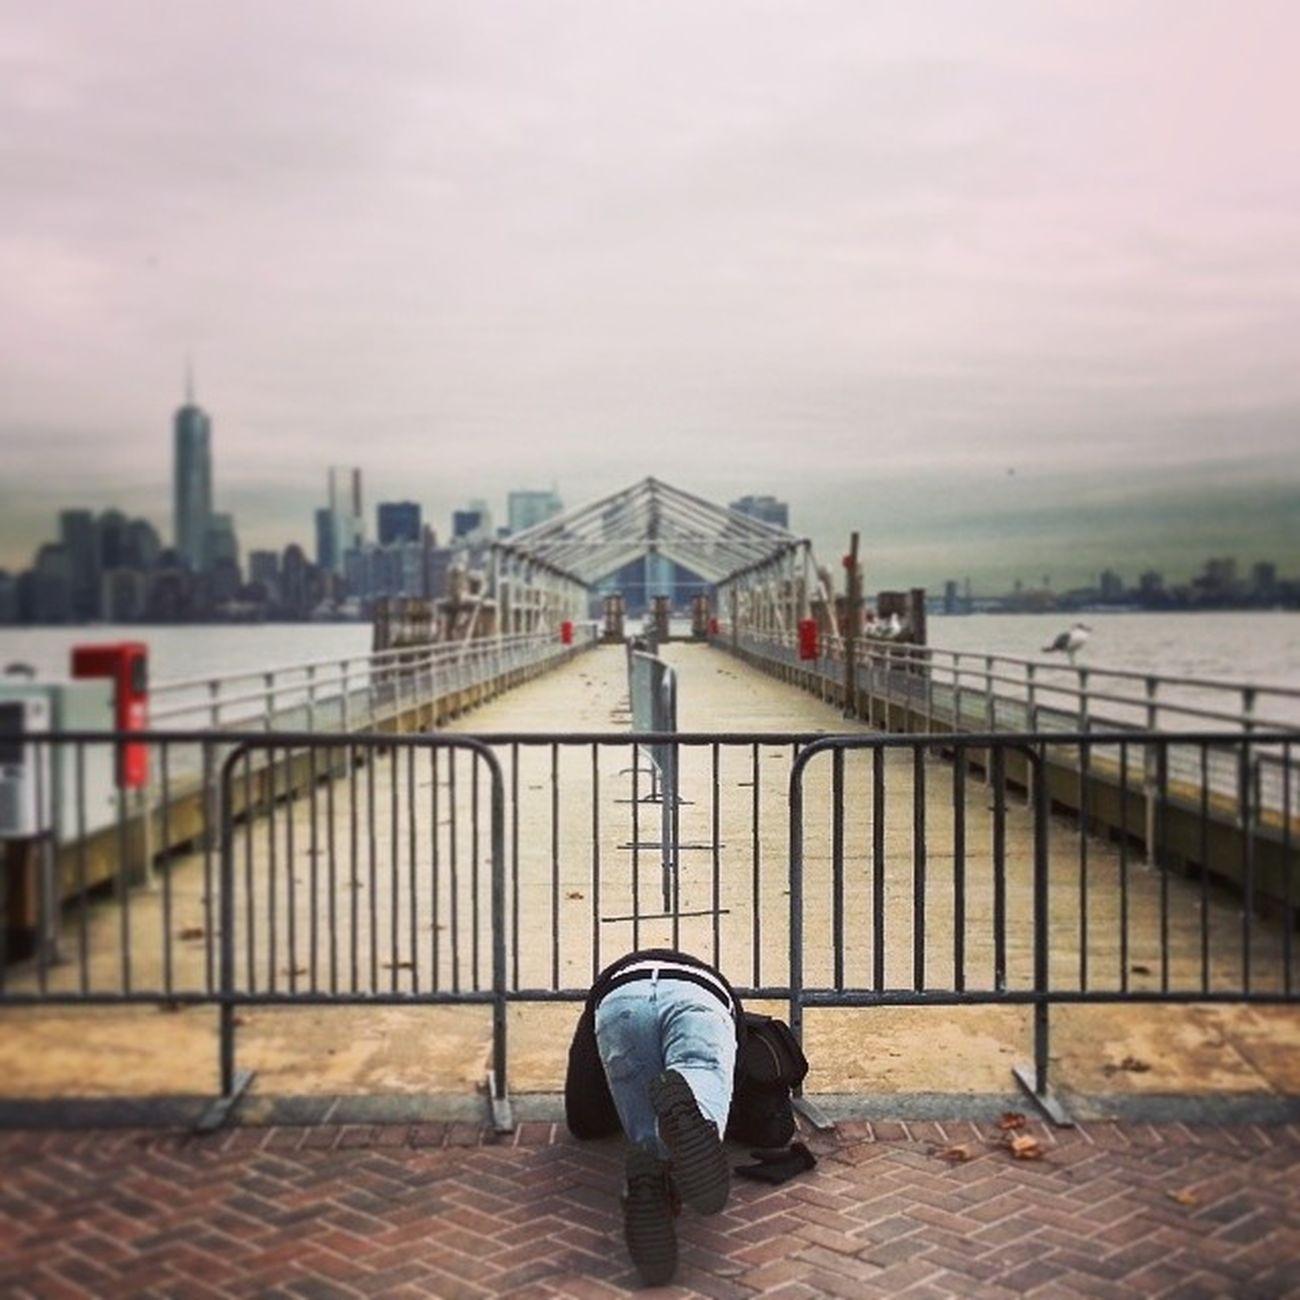 Emilio Caughtgramming . Brannan Lux Touristing  NYC NewYork NewYorkCity statueofliberty igers igersnyc instagramnyc